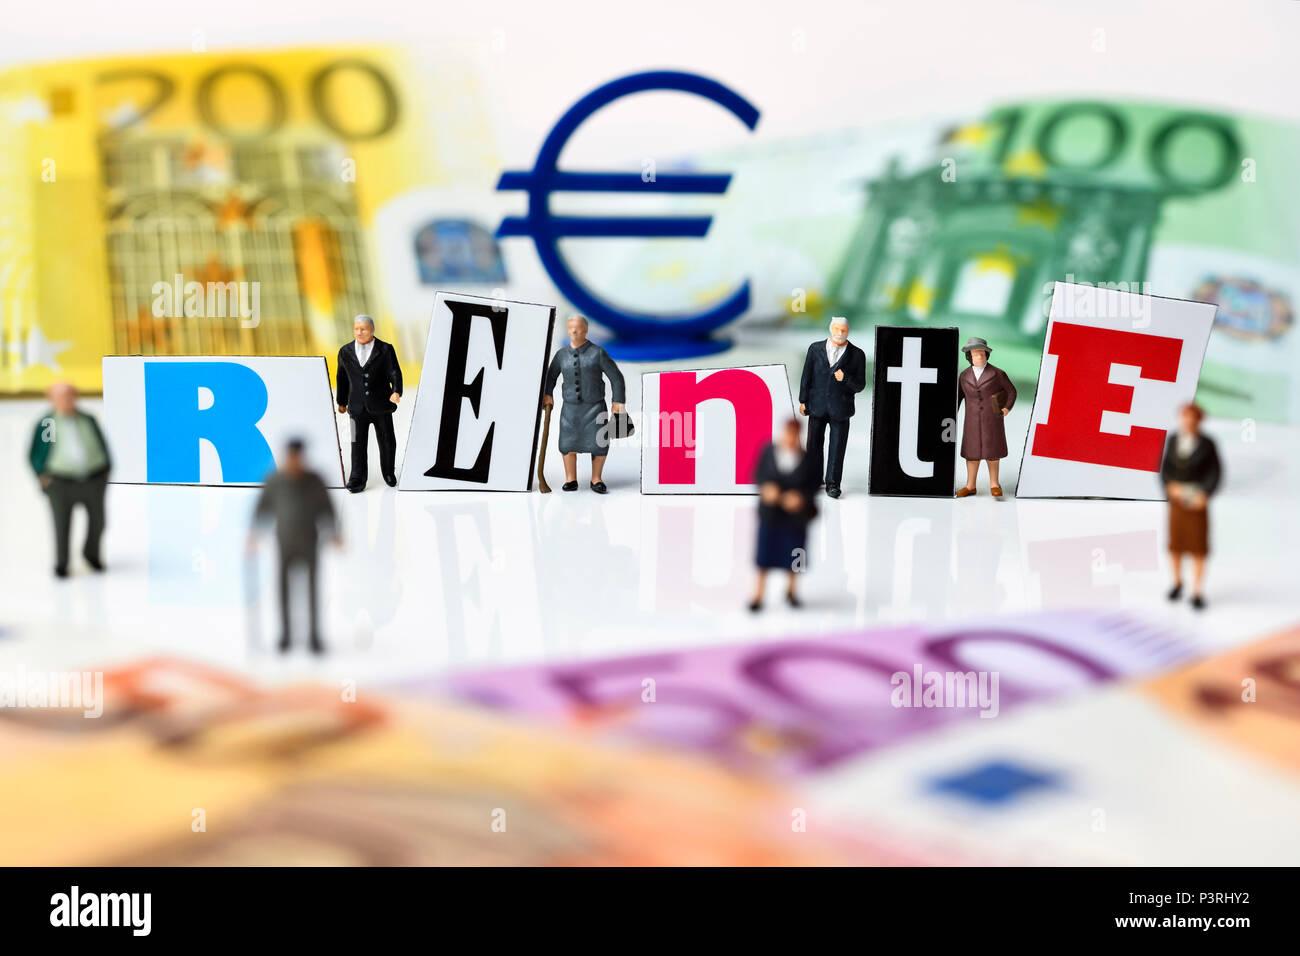 Miniature figures, pensions lettering and banknotes, Miniaturfiguren, Rente-Schriftzug und Geldscheine Stock Photo